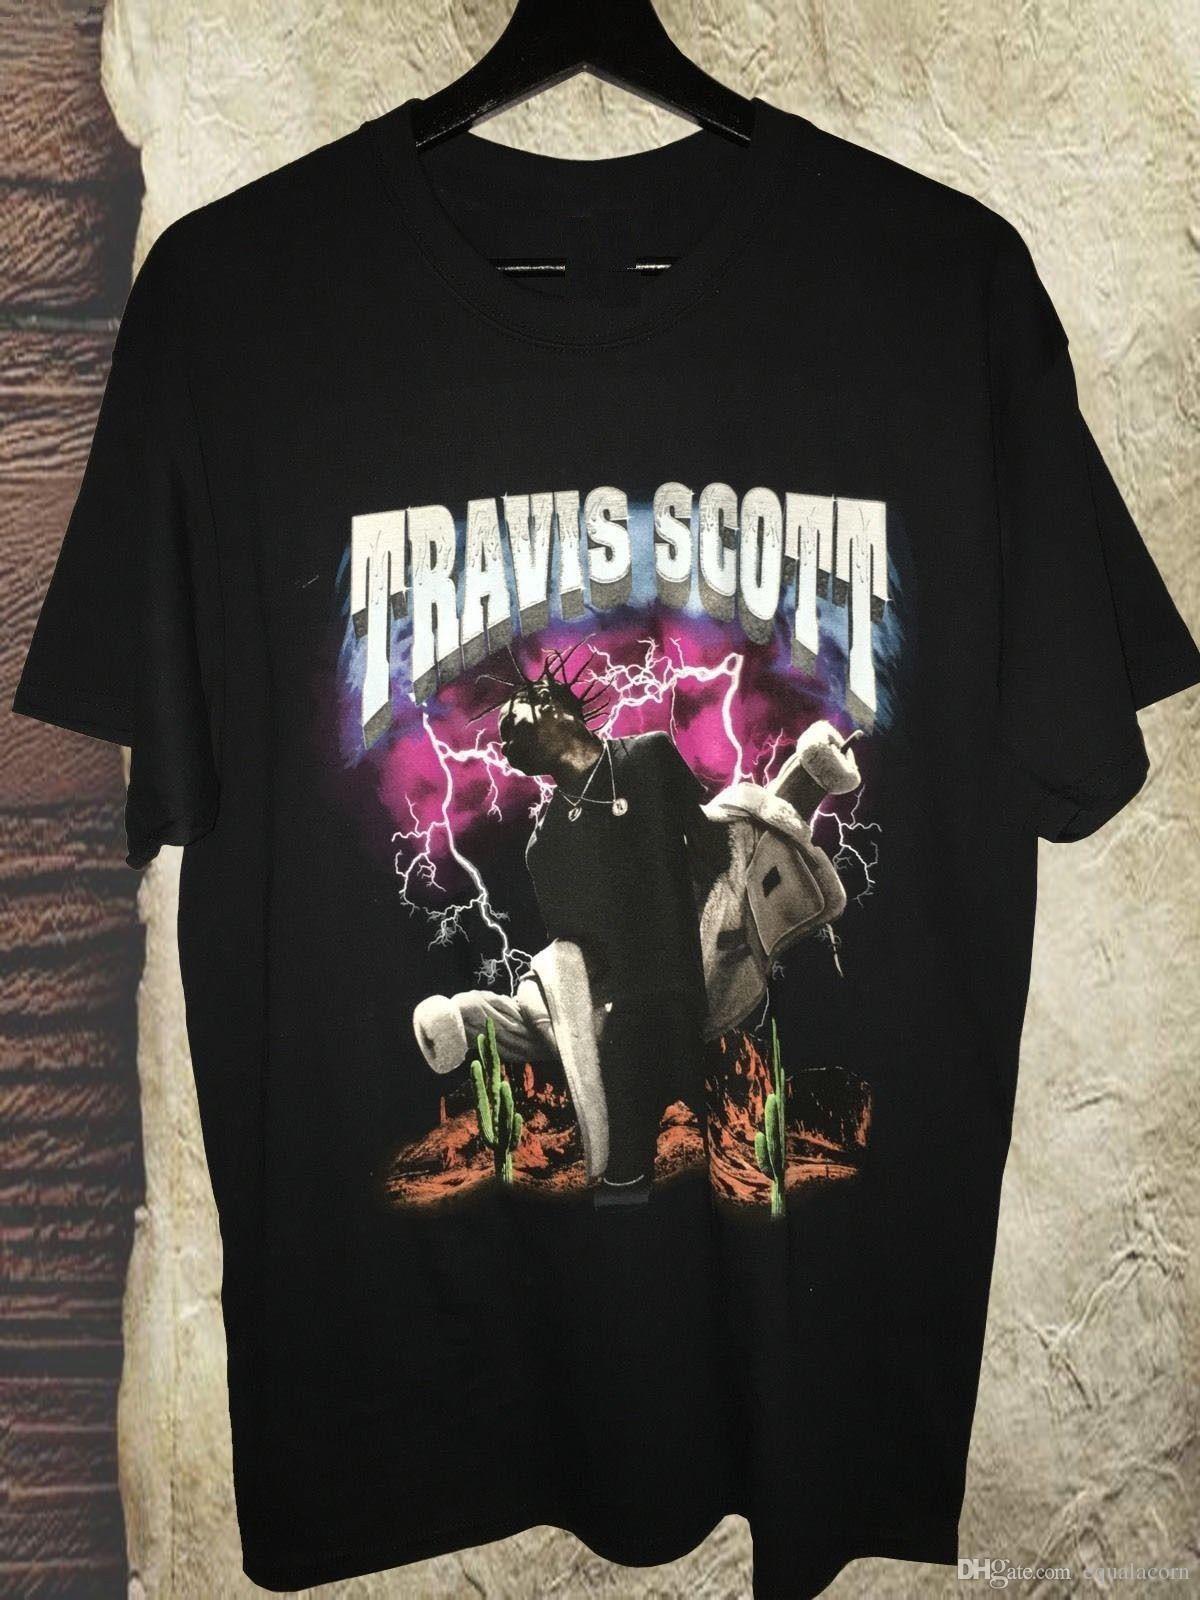 c6ed4a669fb2 Travis Scott Pen & Pixel T Shirt RODEO MADNESS Tour Merch Top Tee T Shirts  Shop Online Of T Shirts From Diyteeplaza, $10.66| DHgate.Com